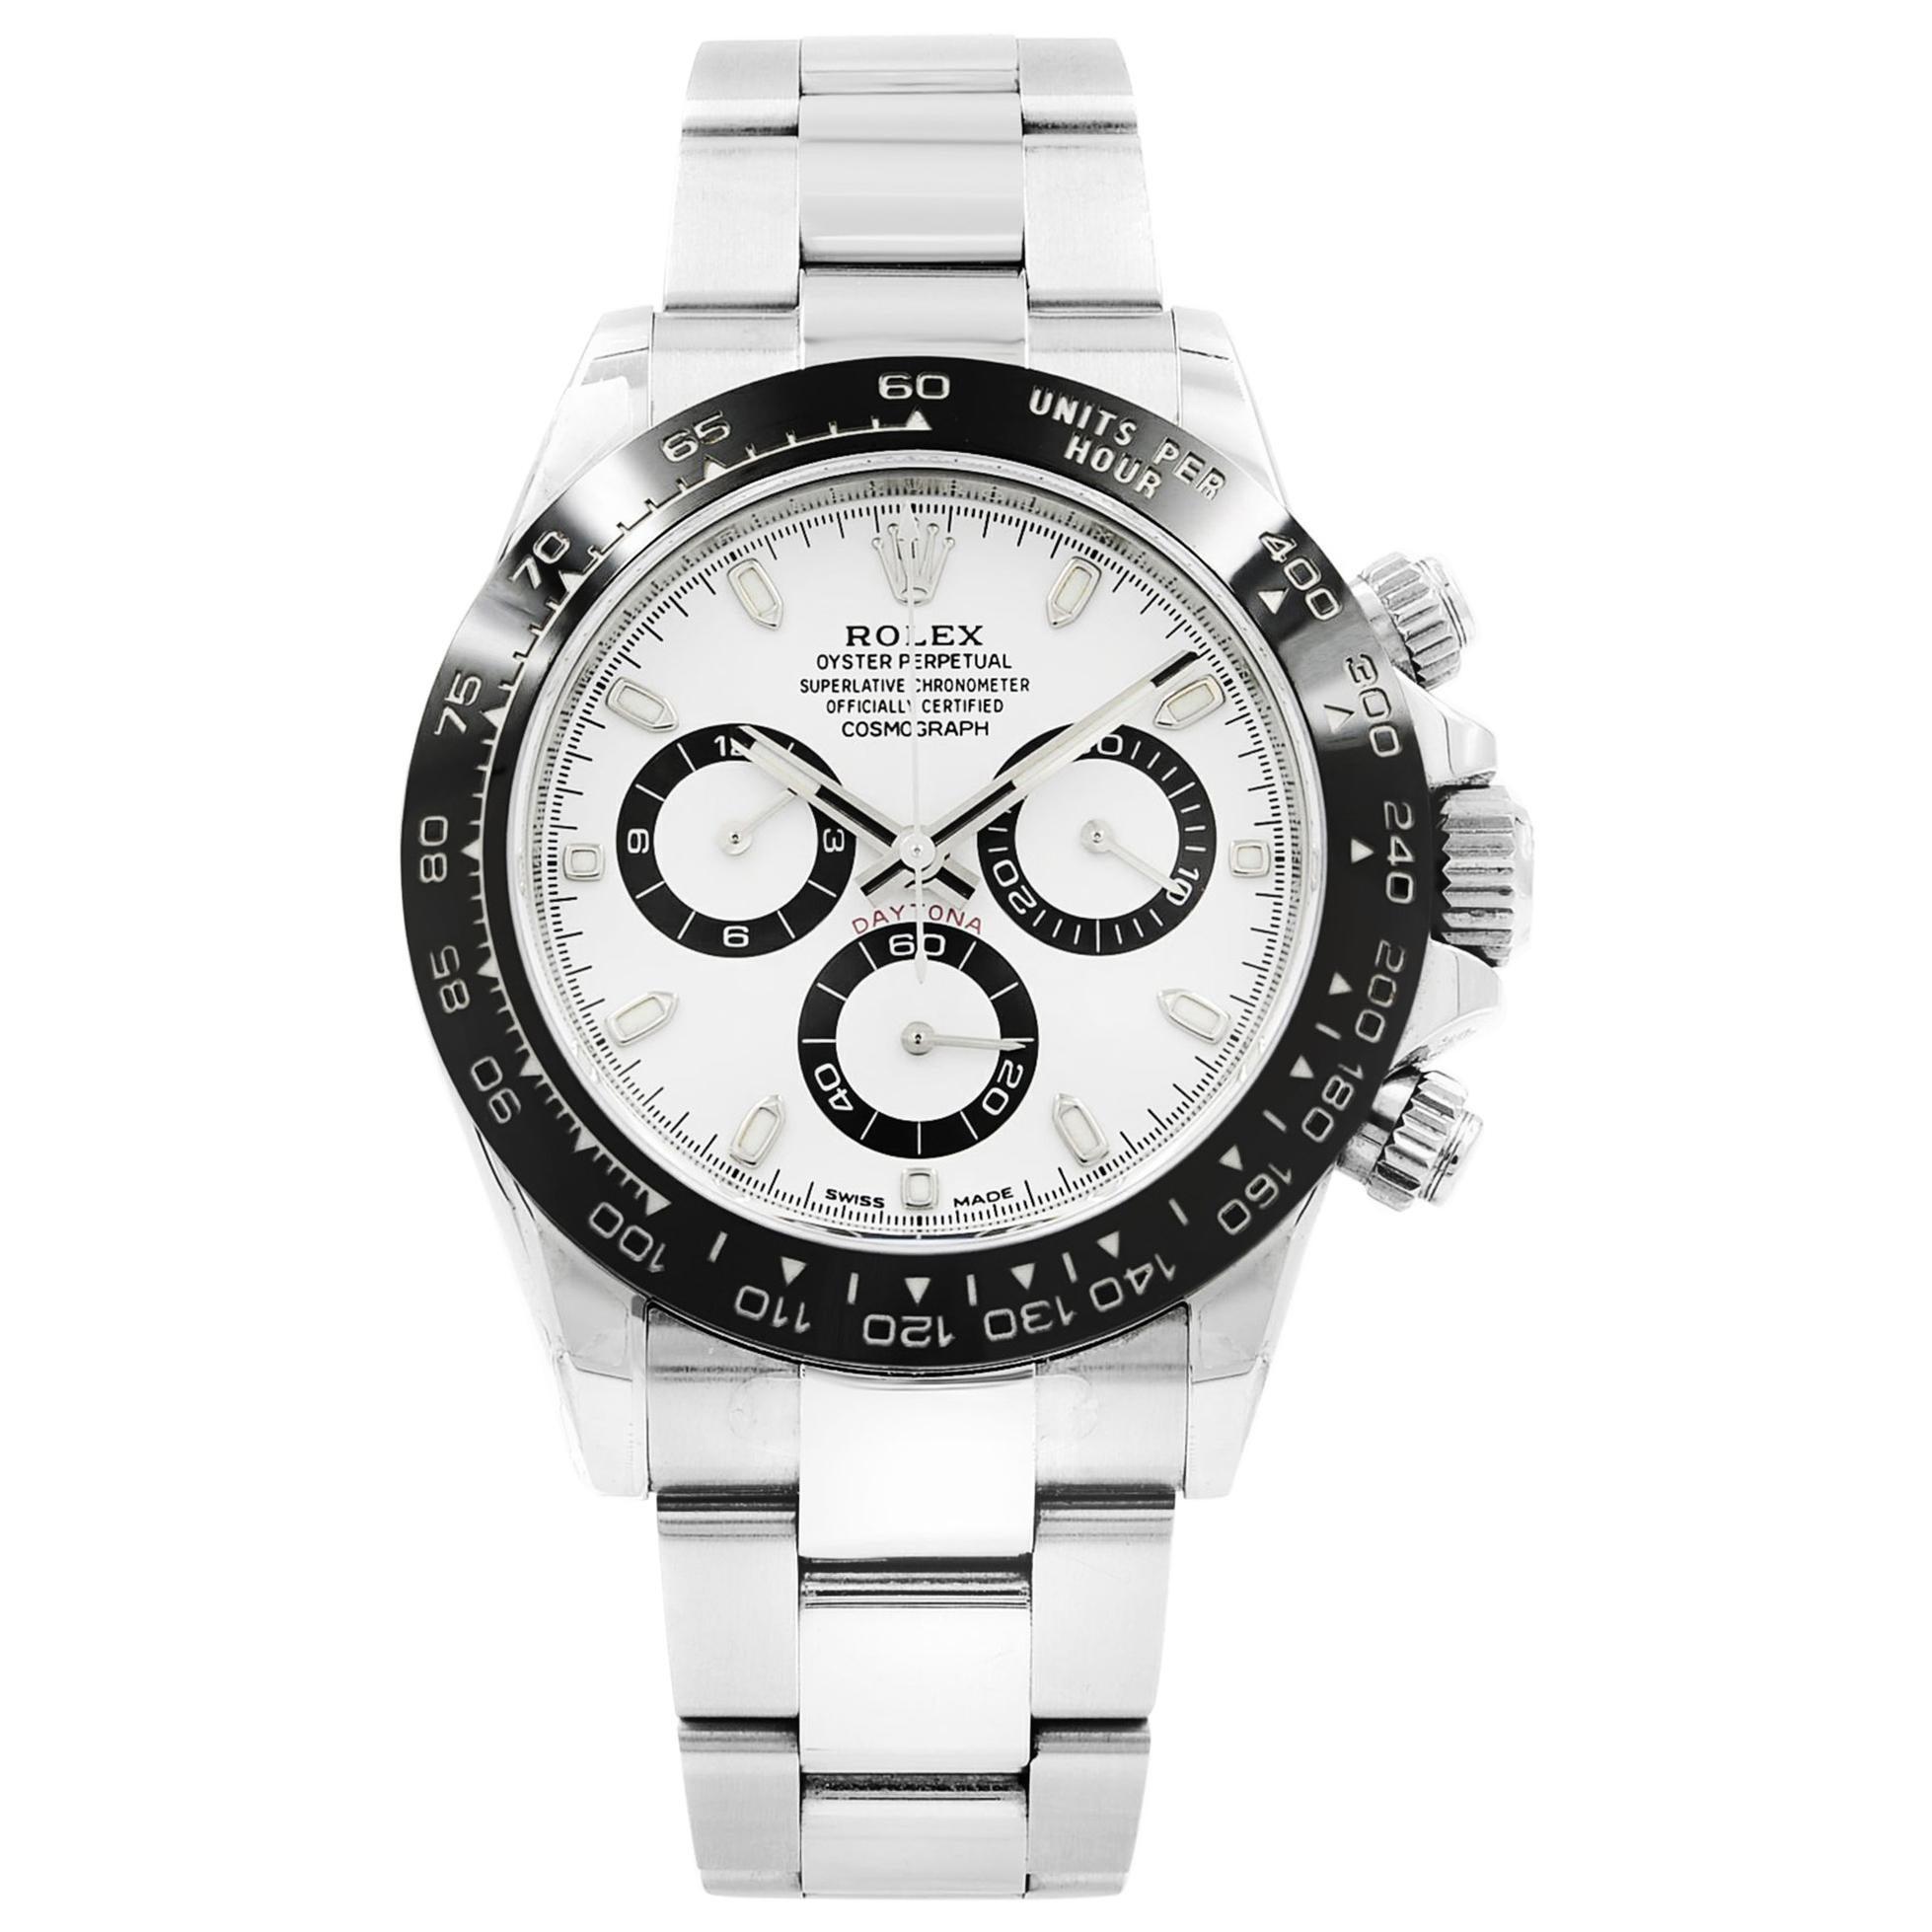 Rolex Daytona Cosmograph White Dial Steel Ceramic Automatic Men's Watch 116500LN